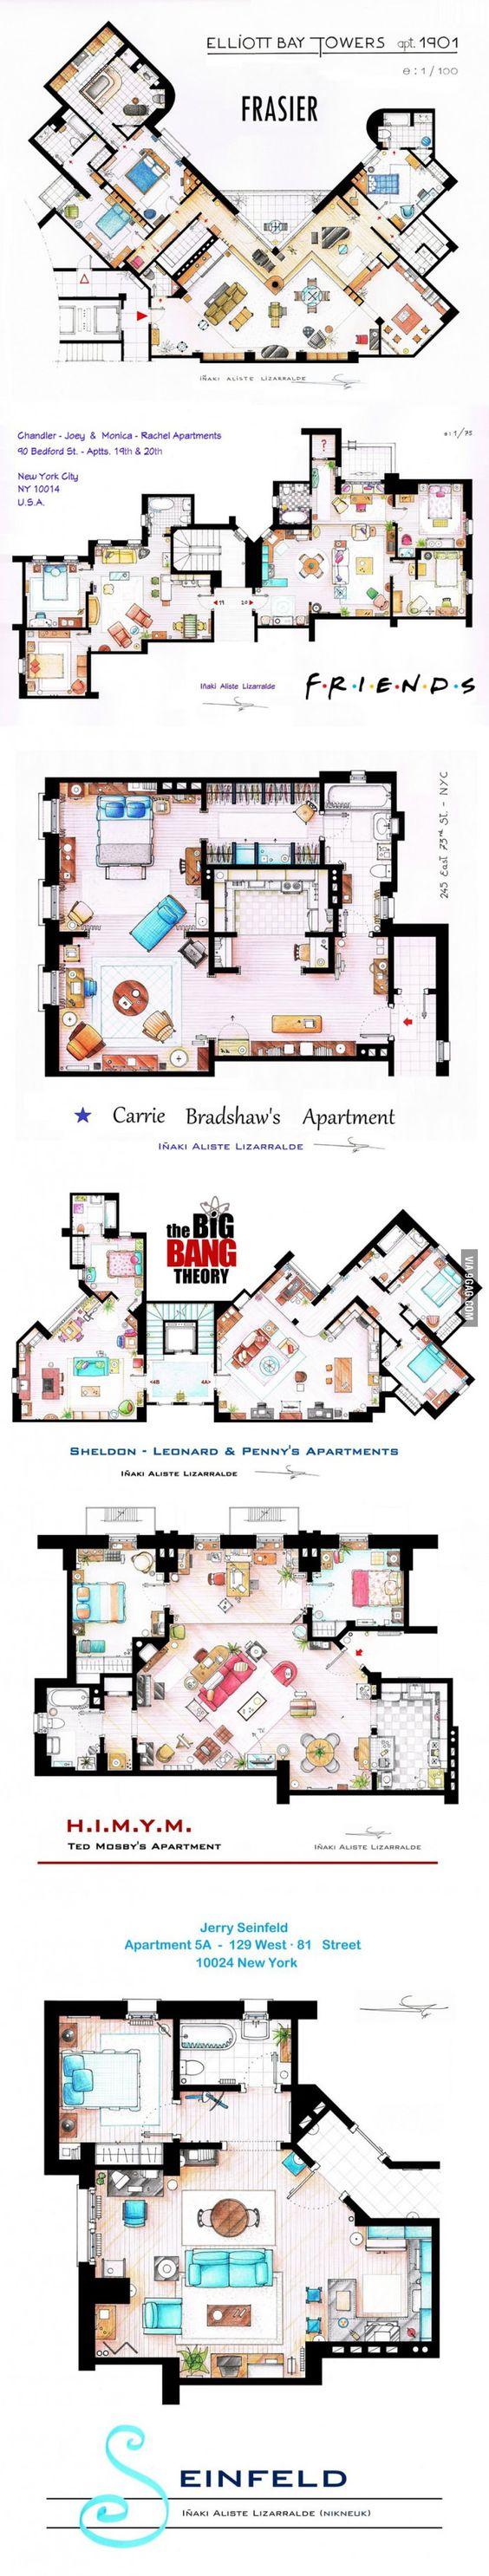 Floor plans from some TV series...omg imagine doing these on the sims?!!!! @Danielle Hernandez @Natalie Hernandez